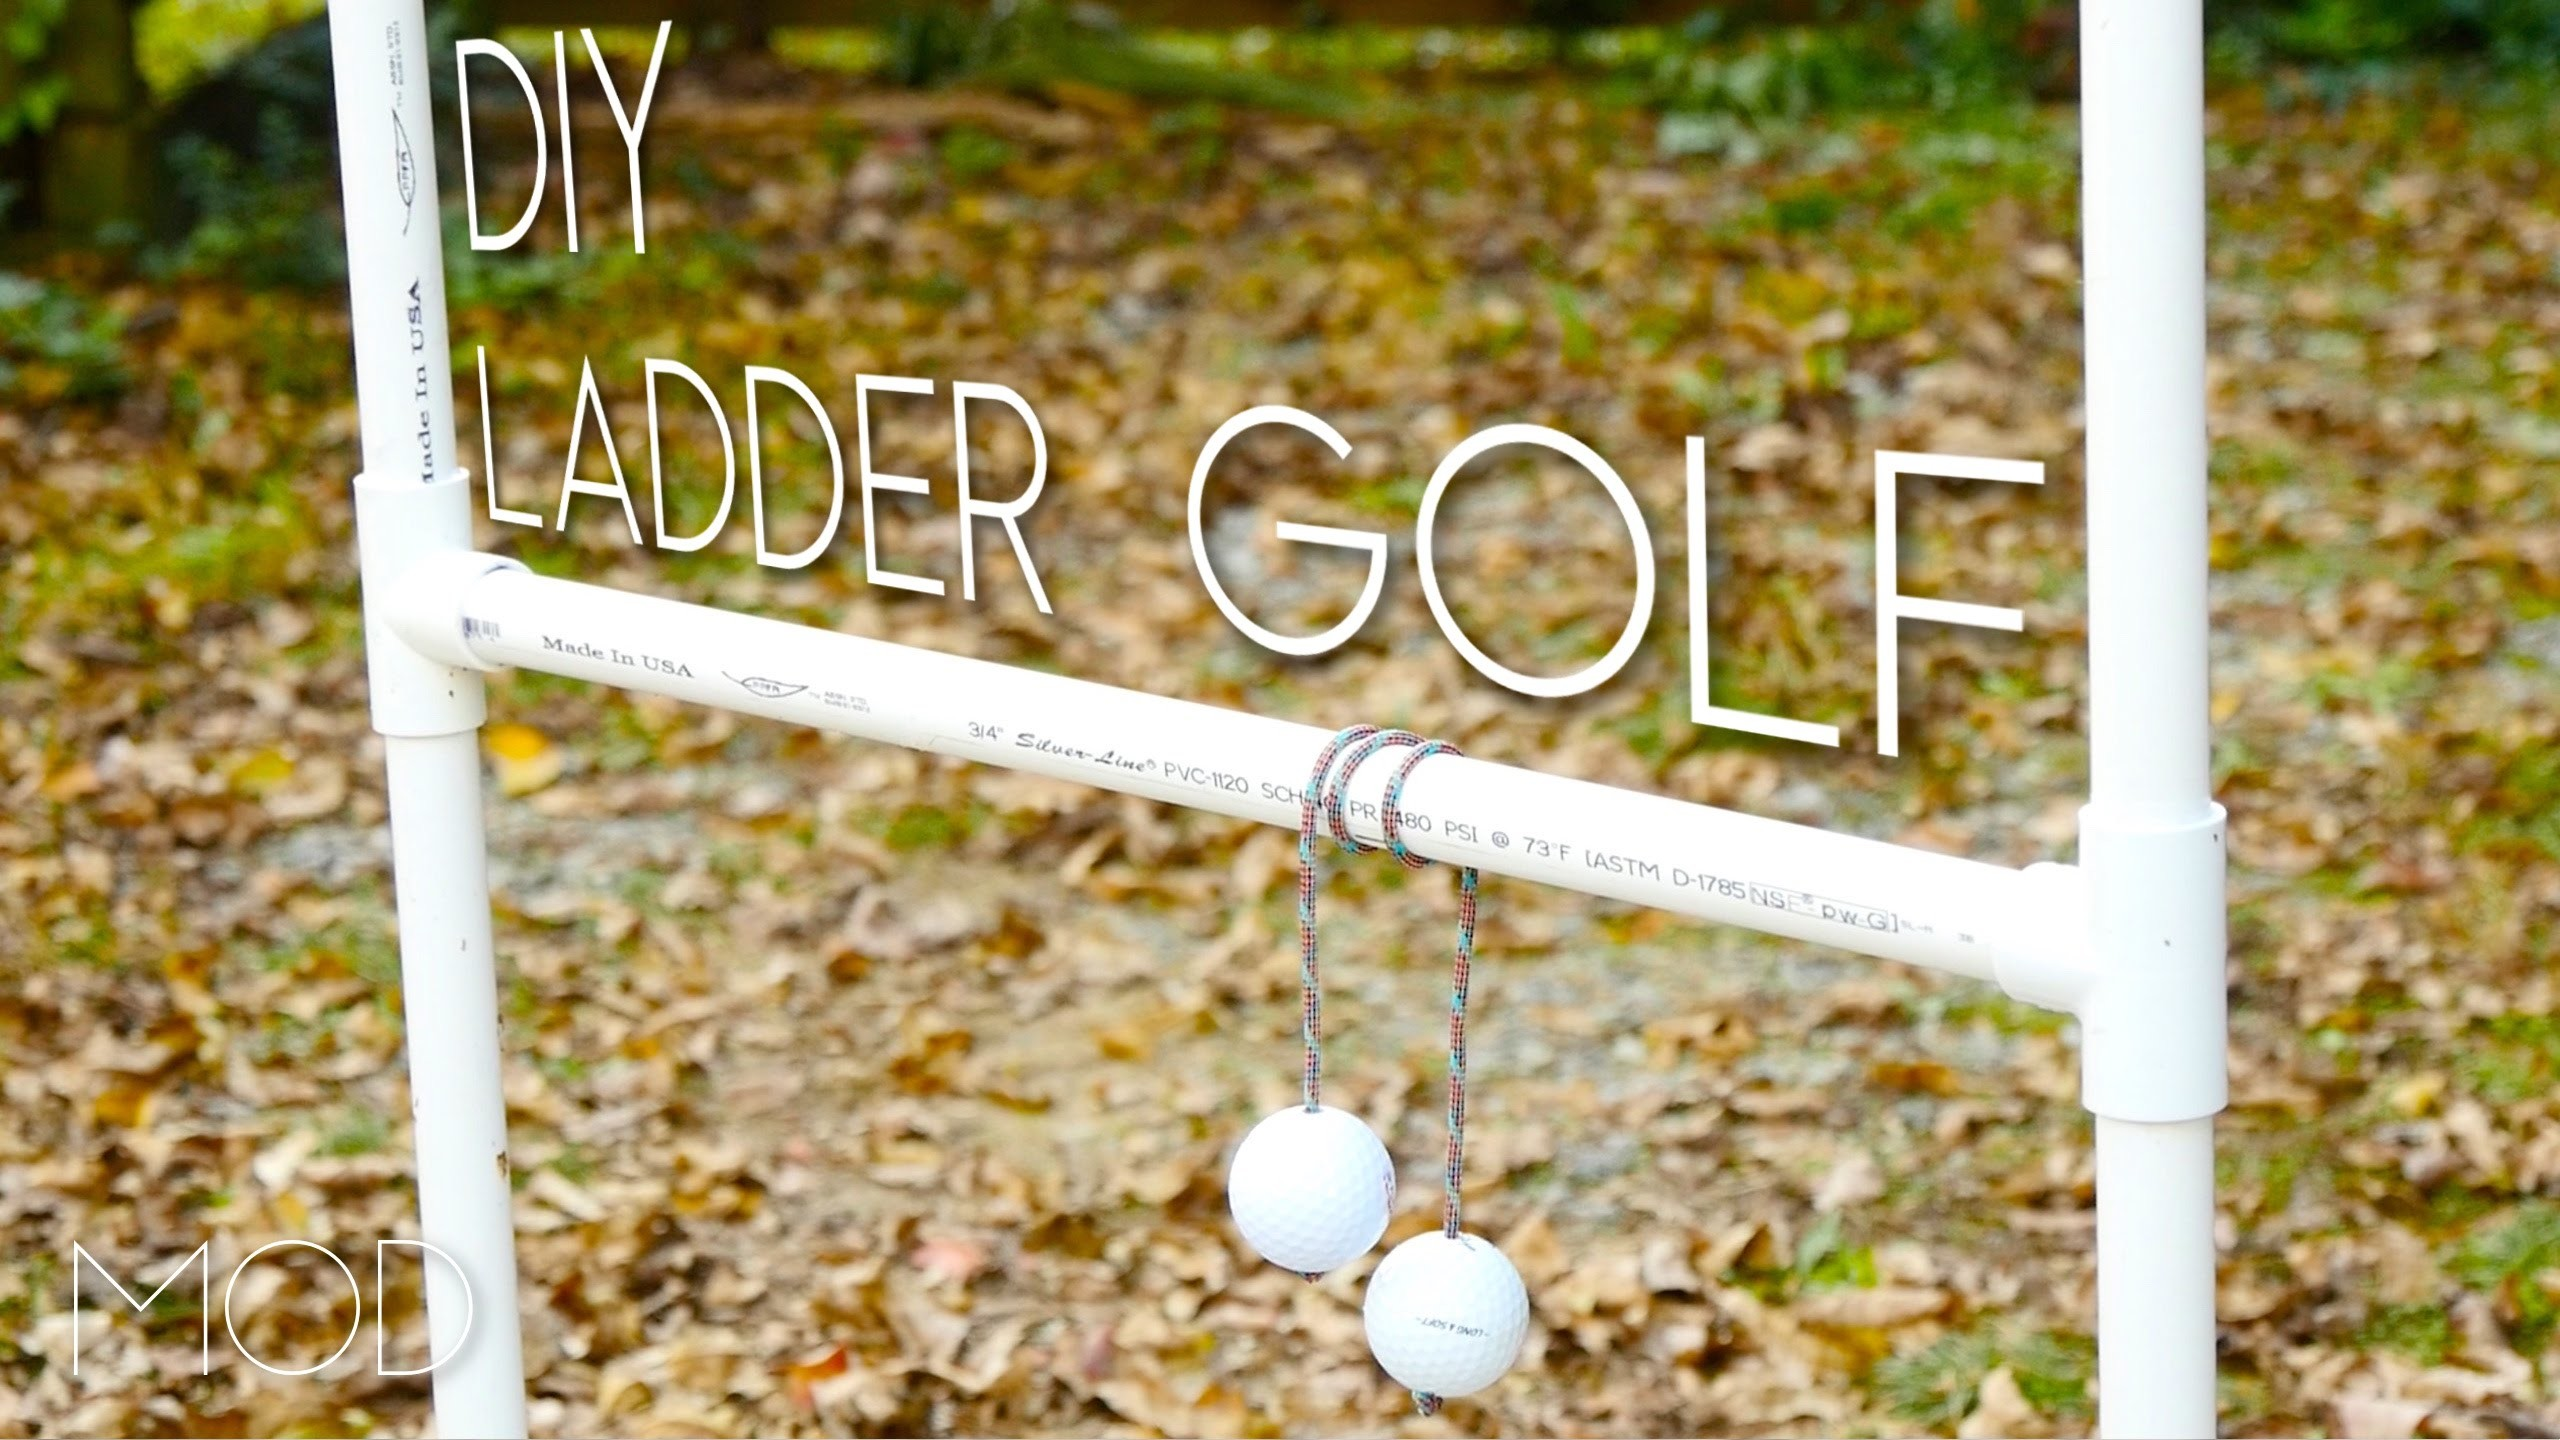 DIY Ladder Ball